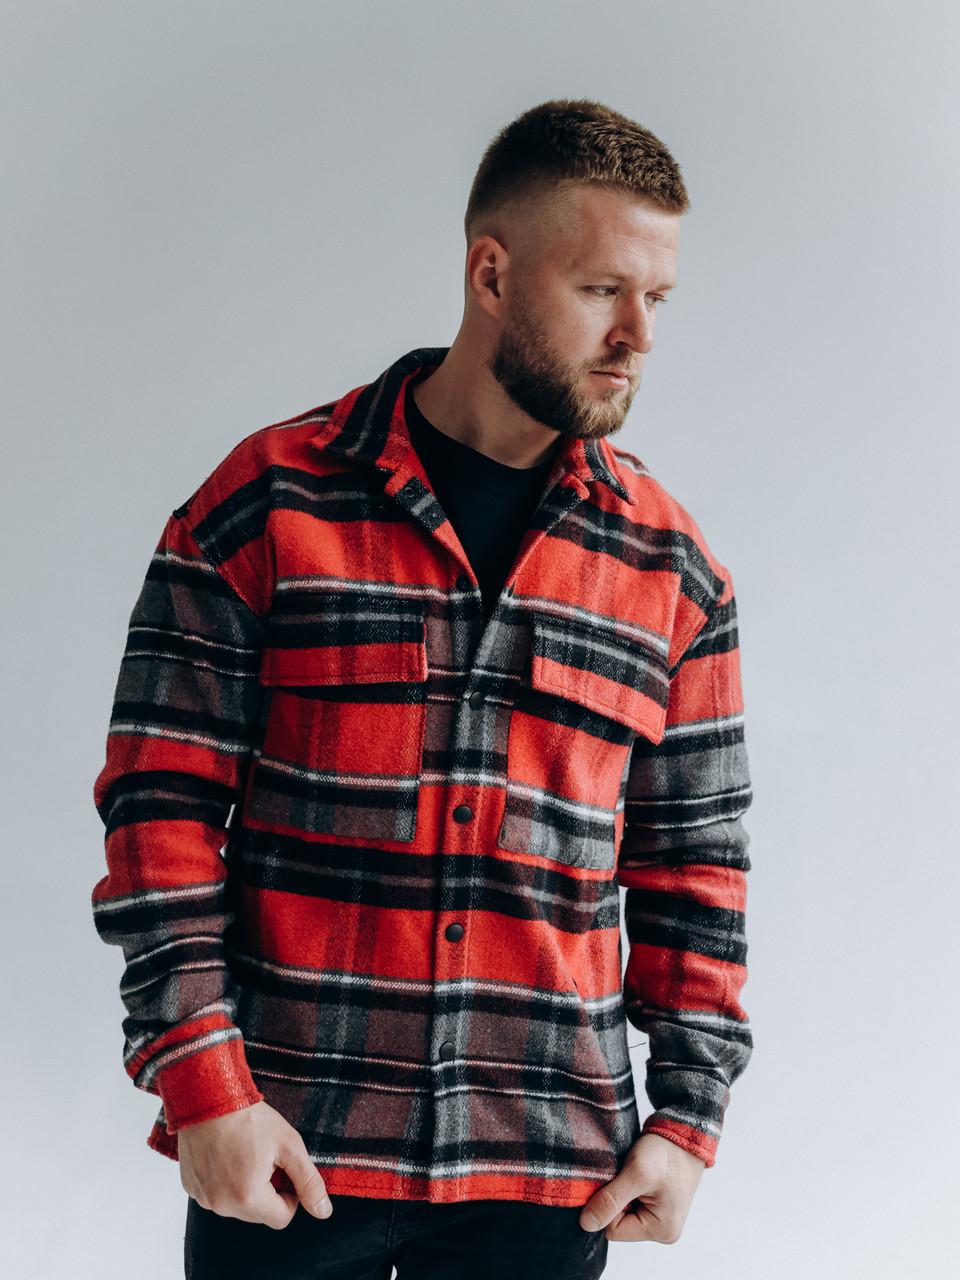 Мужская клетчатая теплая байковая куртка-рубашка на пуговицах с карманами красно-серая